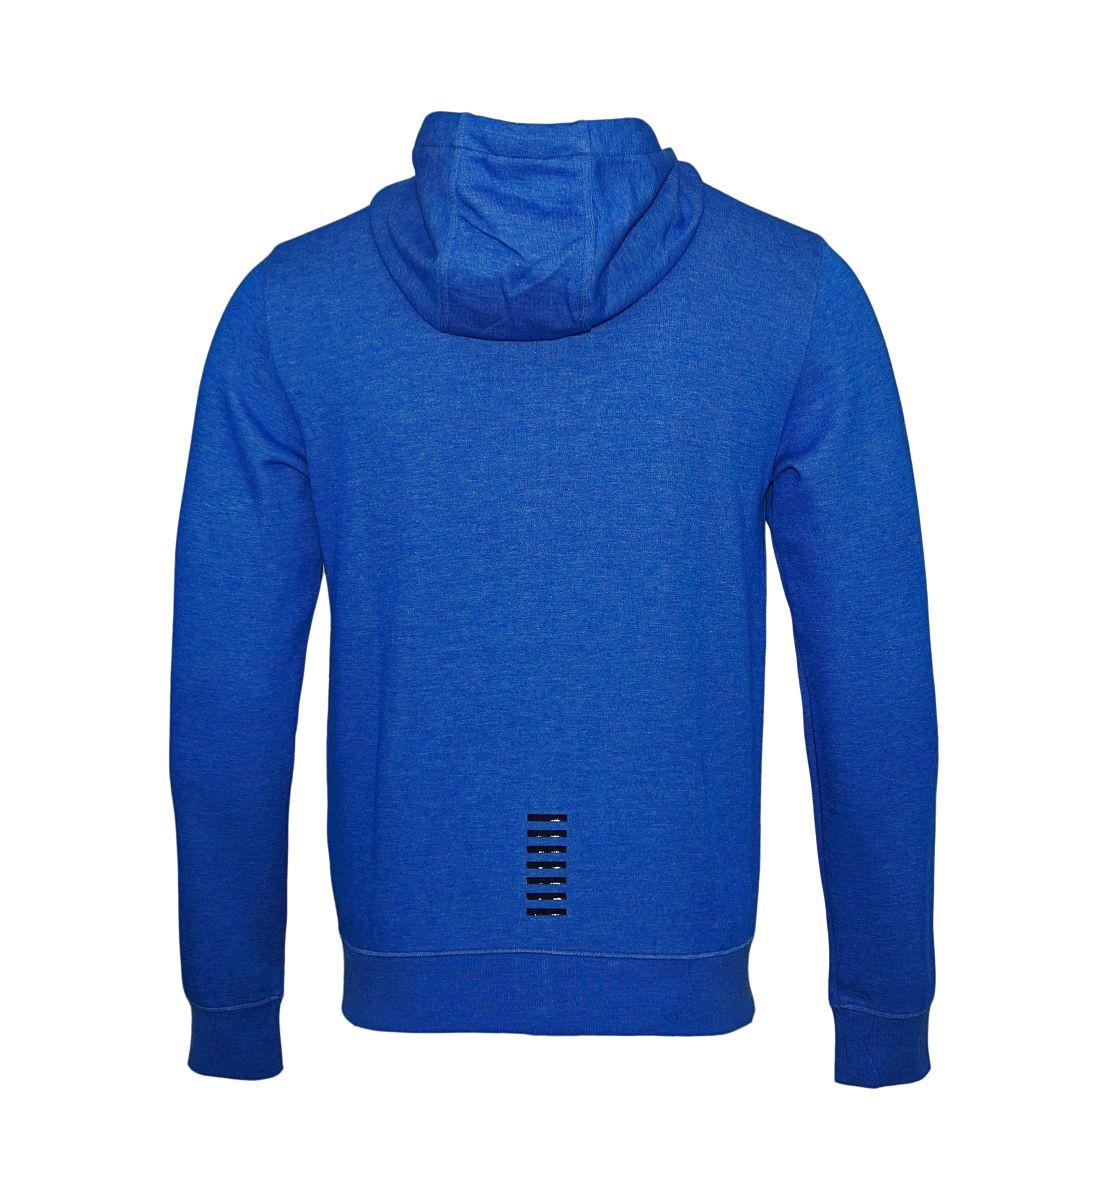 EA7 Emporio Armani Sweatshirt Jacke Hoodie 6YPM69 PJF3Z 3501 Bluette Melange HW17-EAS1